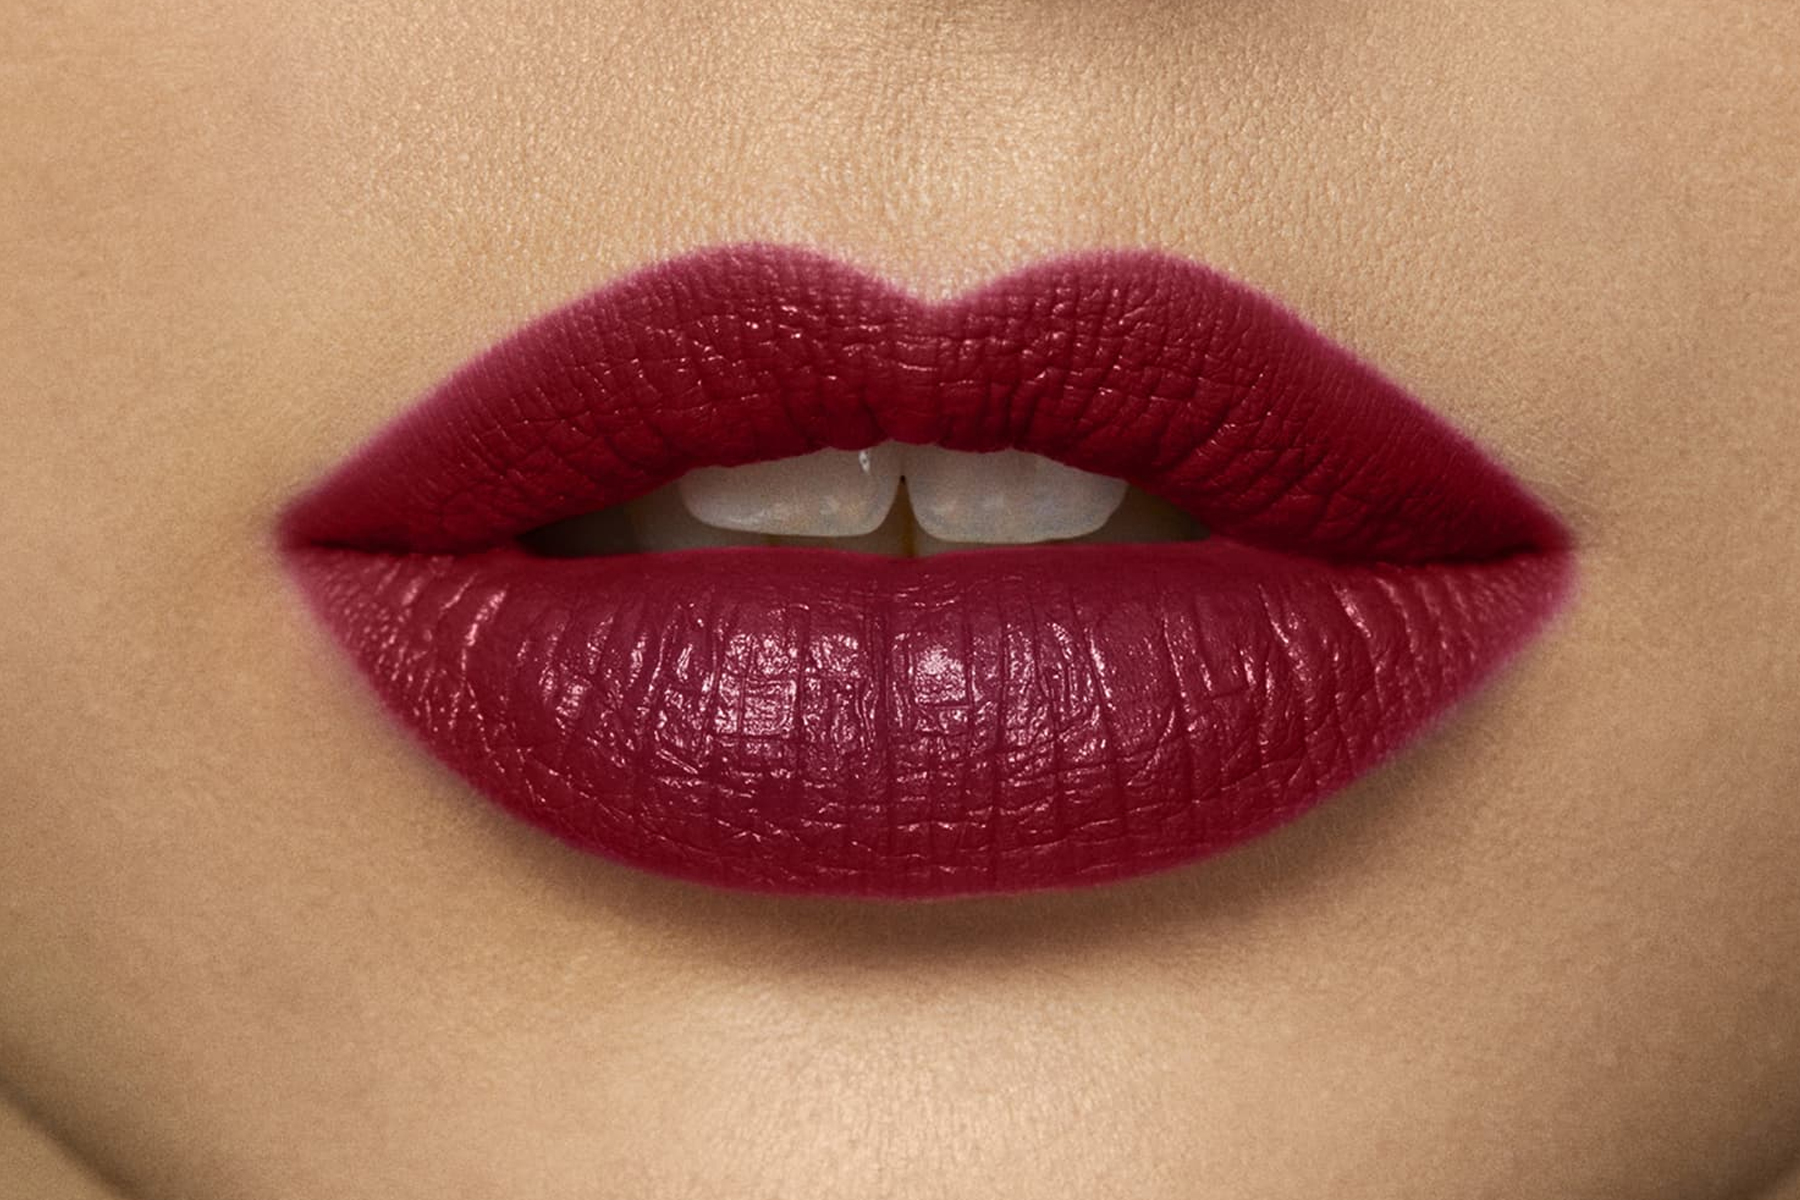 laura-mercier-rouge-essentiel-rose-rouge-swatch